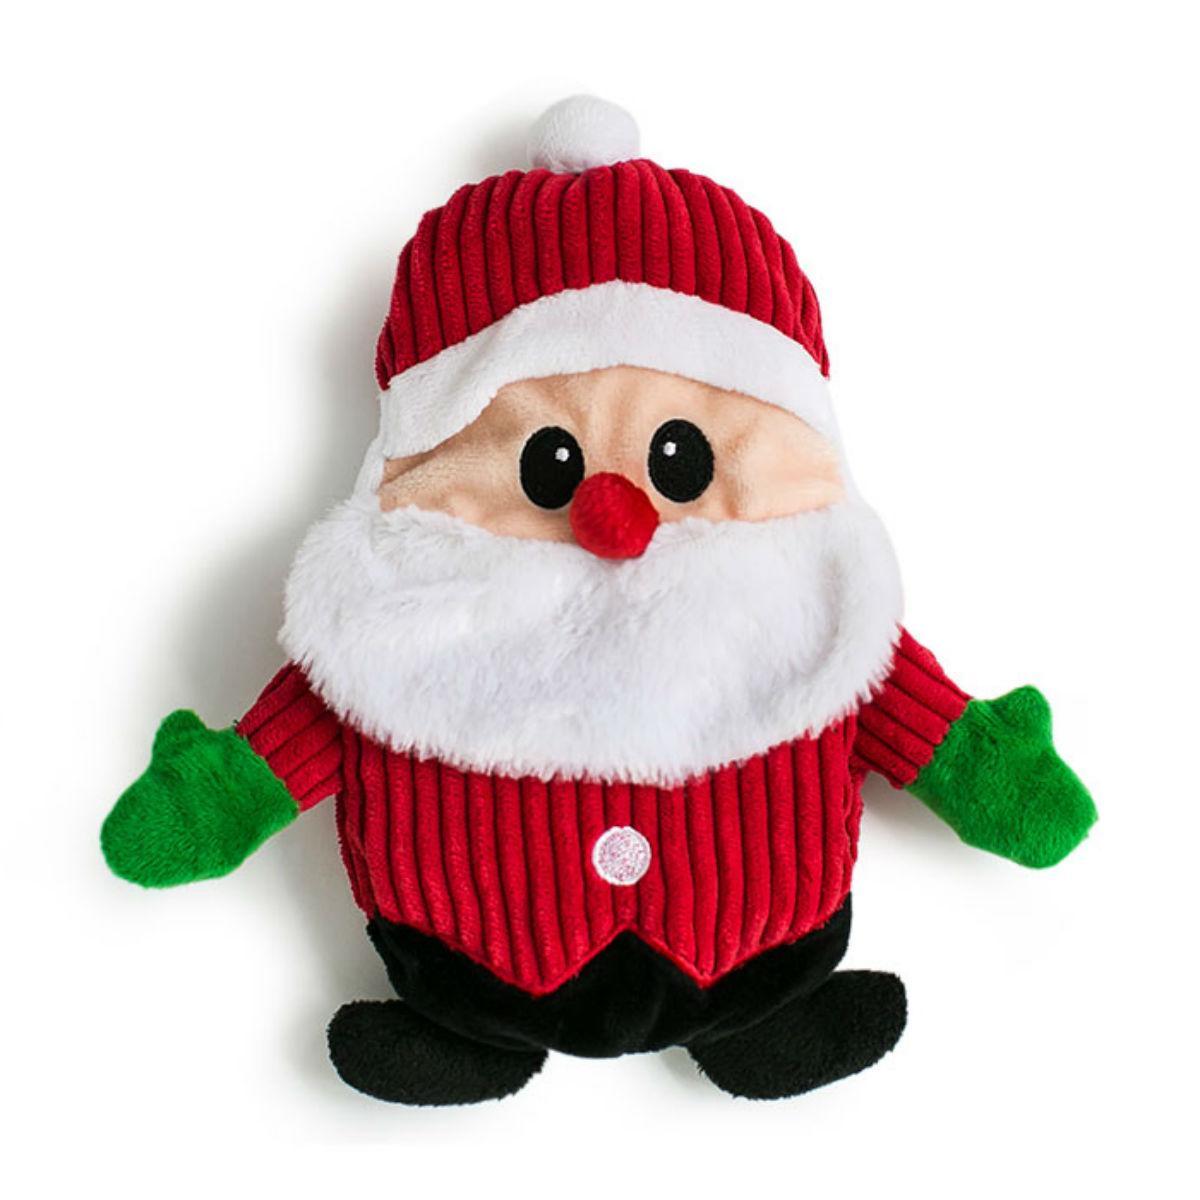 Hatchables X-Mas Dog Toy - Santa/ Ornament